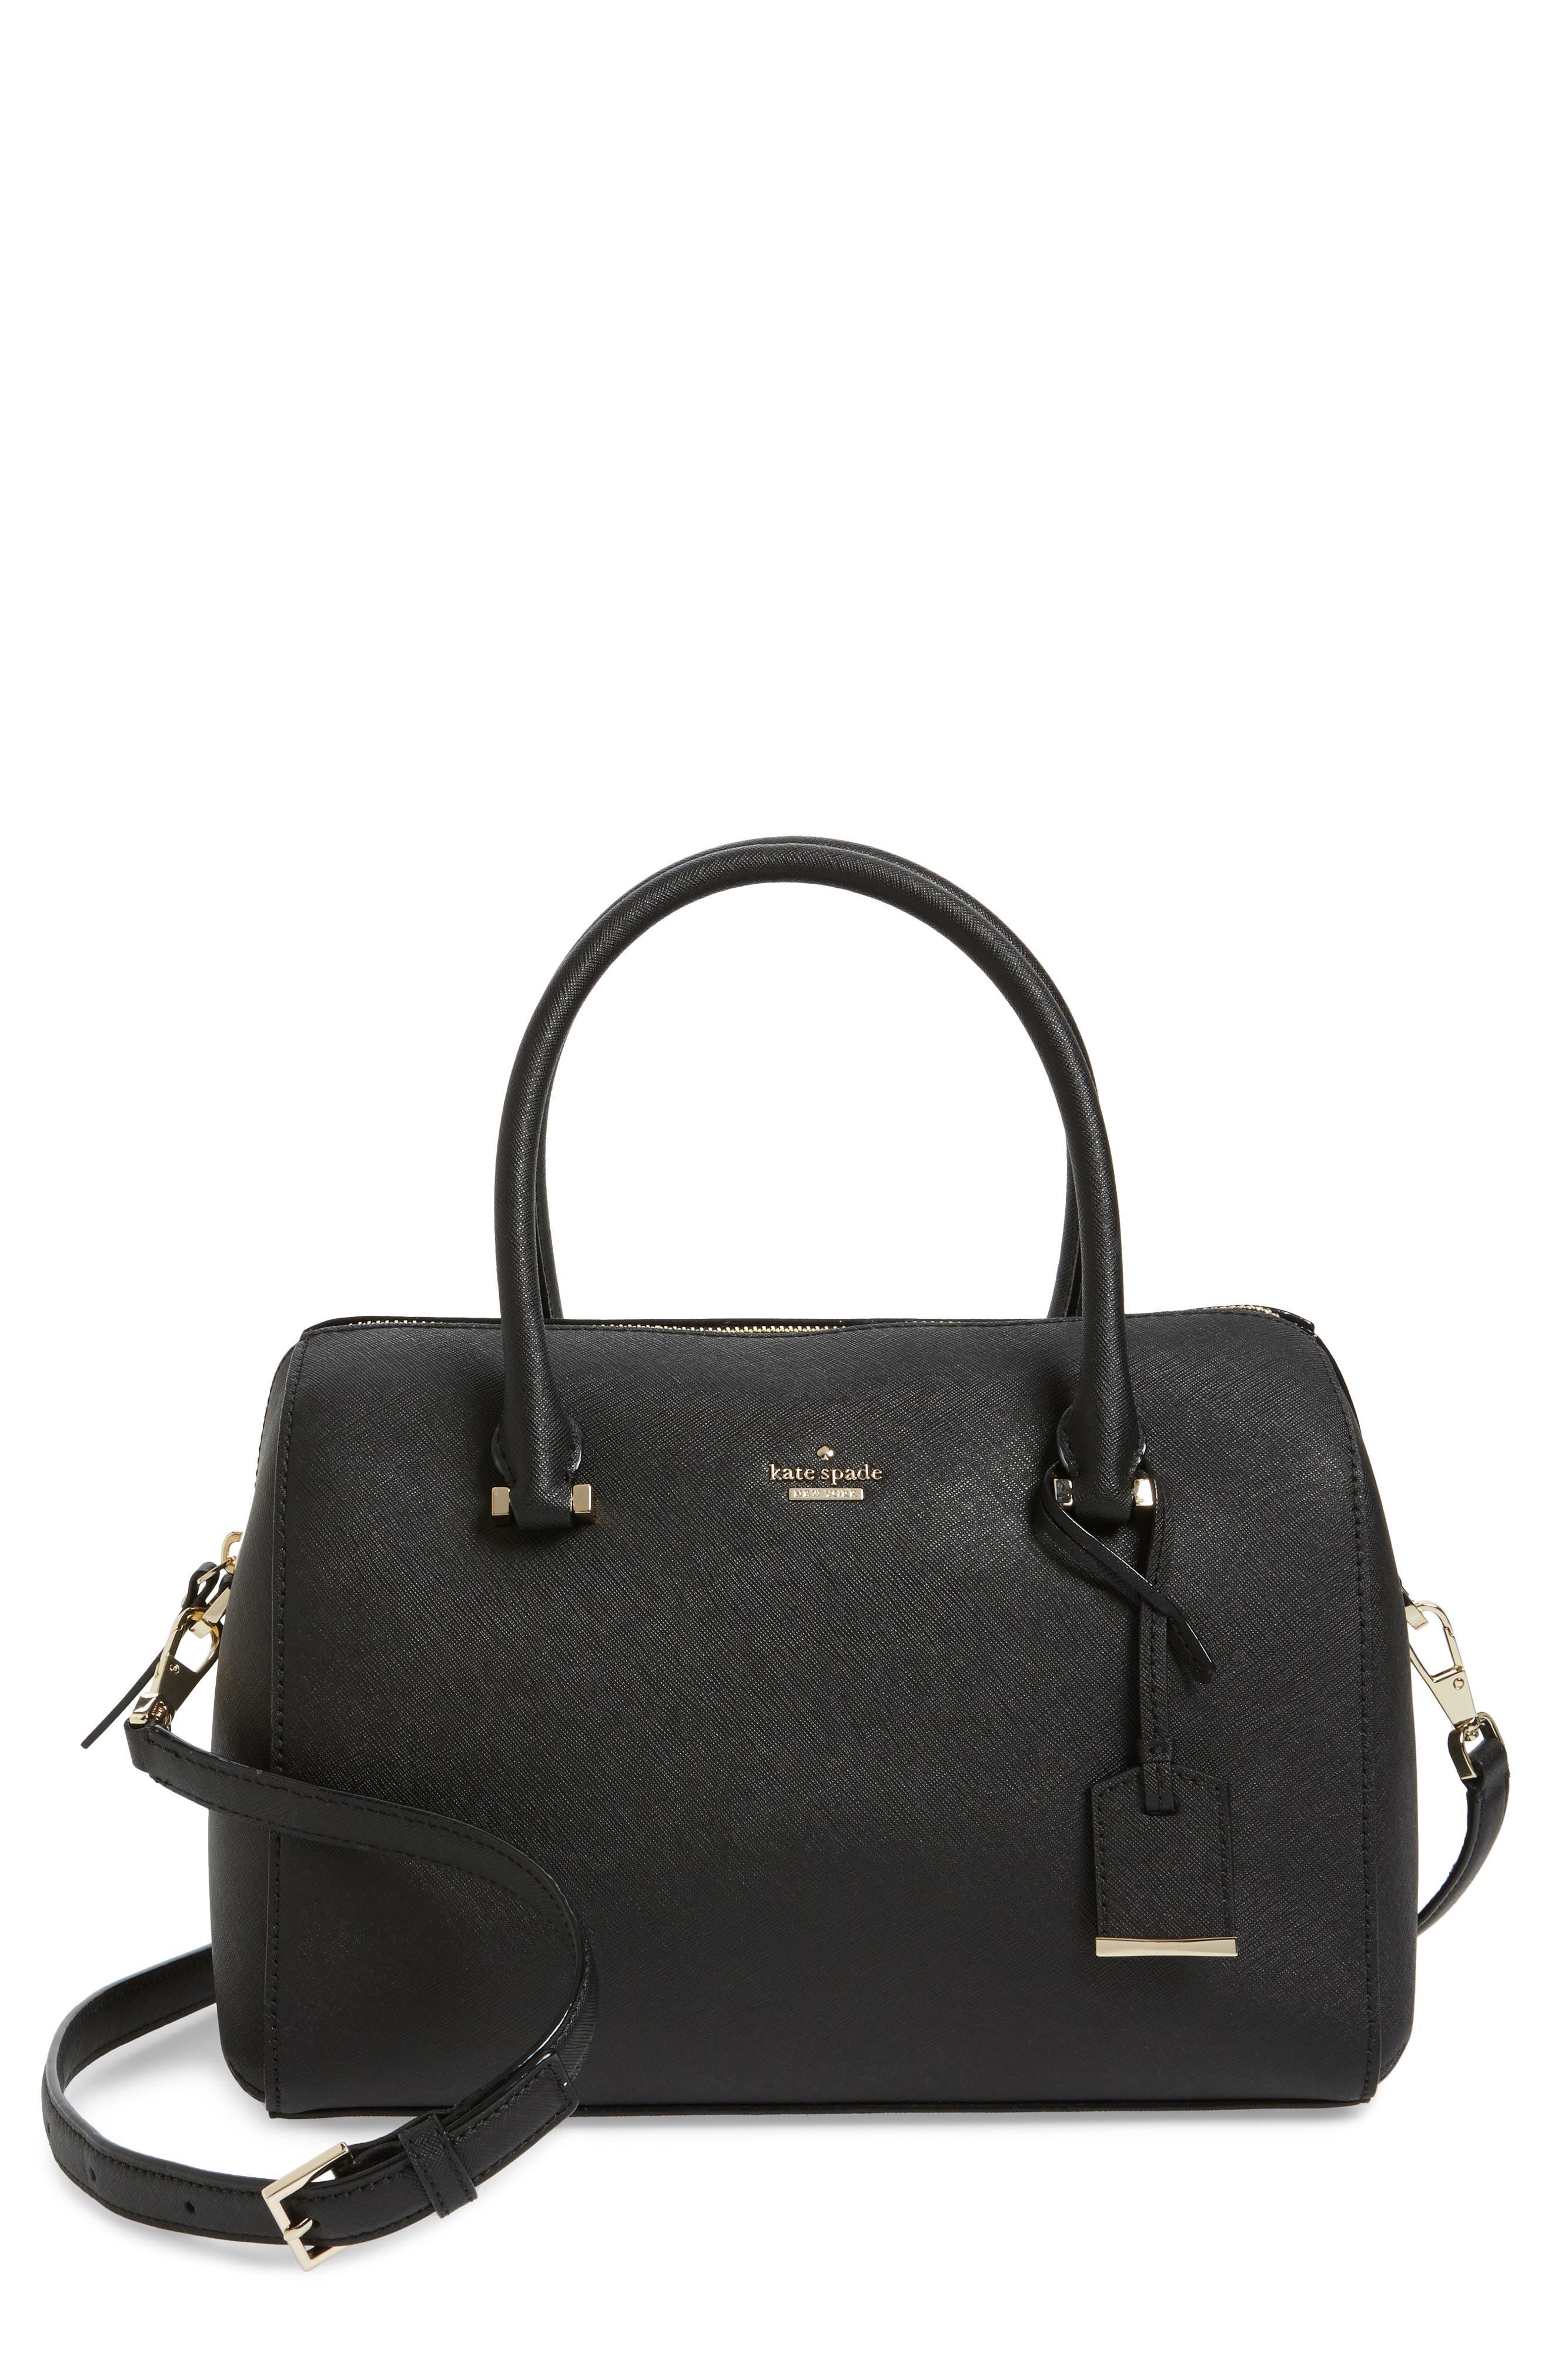 KATE SPADE NEW YORK mega cameron street - lane leather satchel